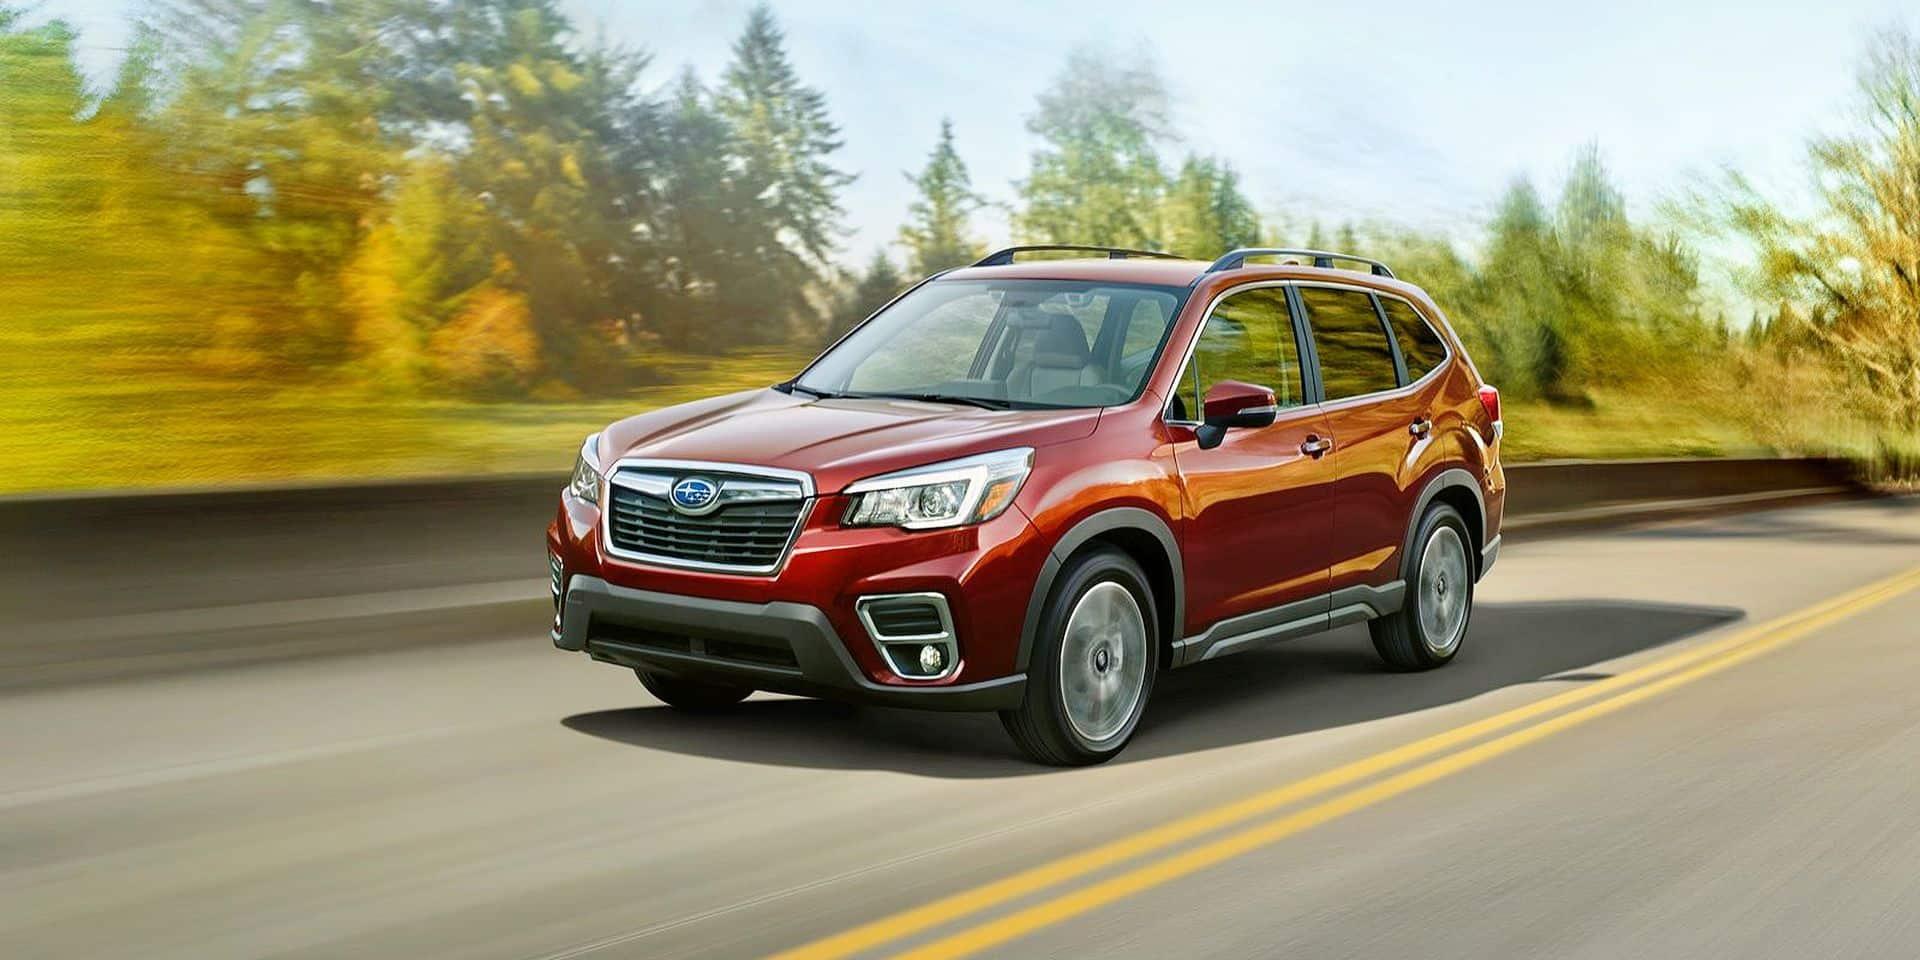 Essai Auto : le Subaru Forester passe à l'hybride